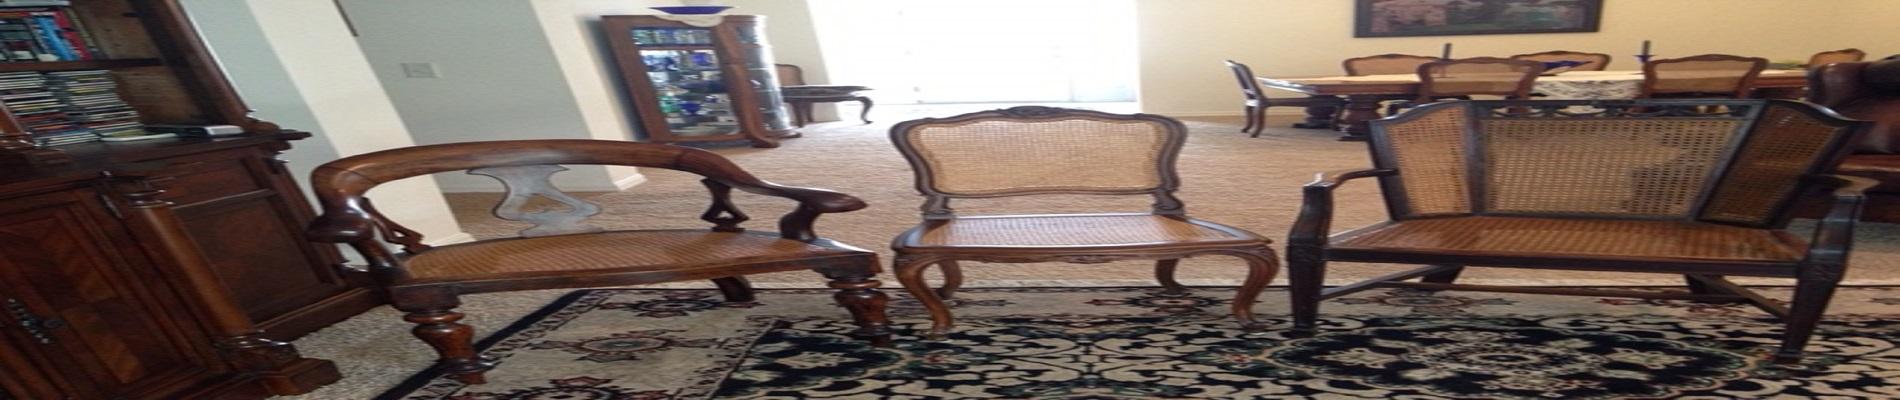 Veterans Chair Caning & Repair image 1